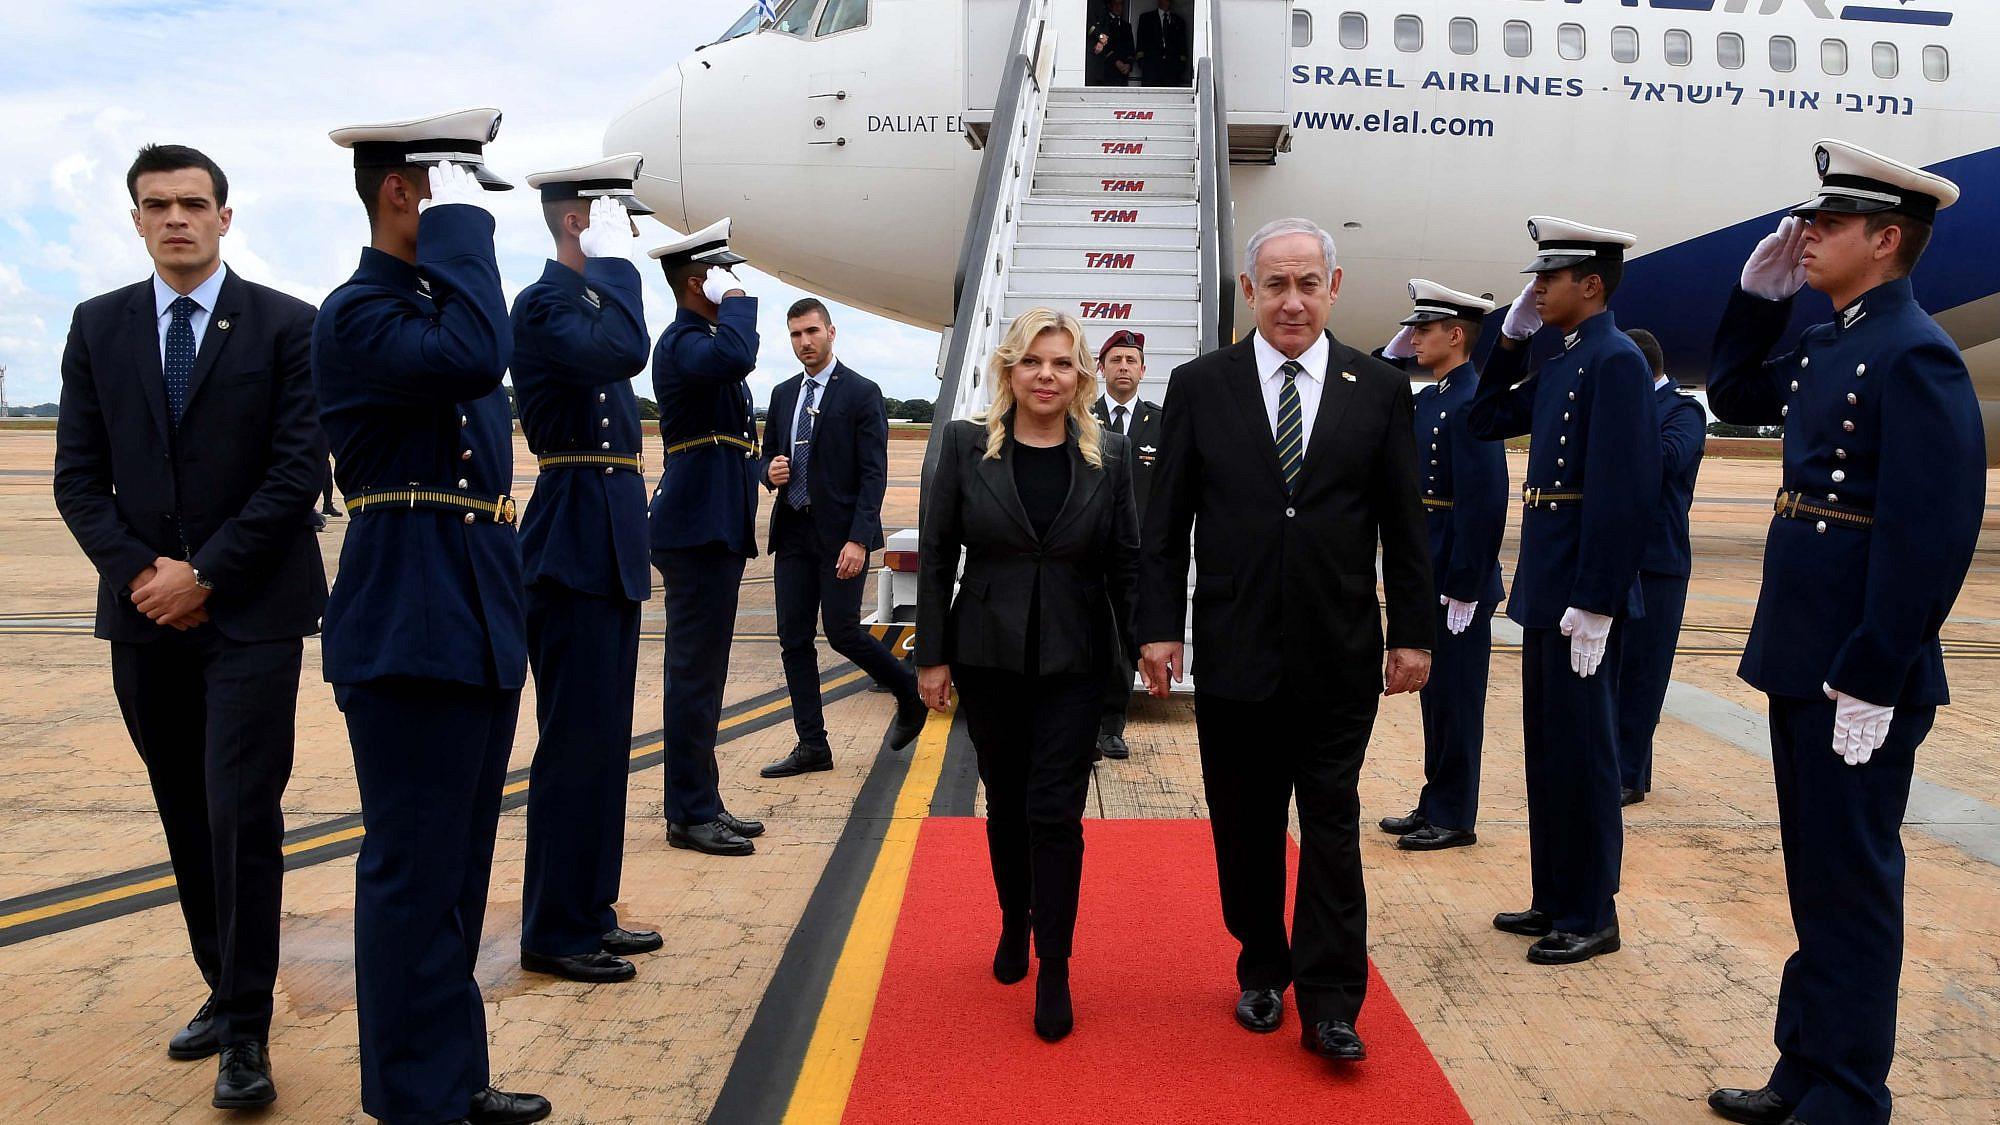 Israeli Prime Minister Benjamin Netanyahu and his wife Sara arrive in Brazil. January 2, 2019. Photo by Avi Ohayon (GPO).